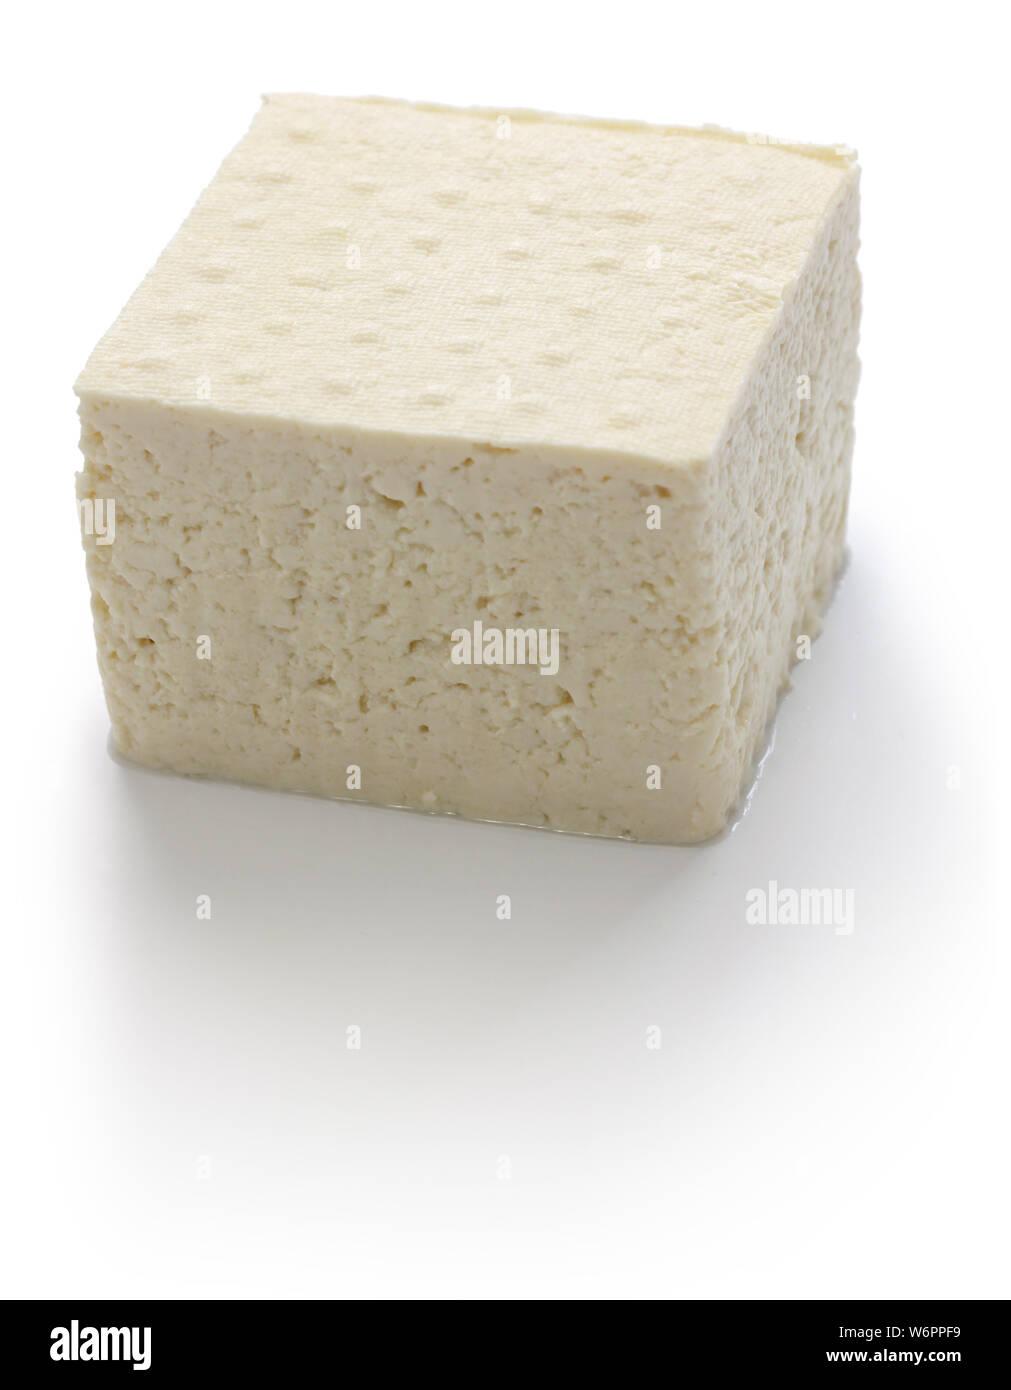 shima Tofu is a Japanese Okinawan Tofu. Stock Photo